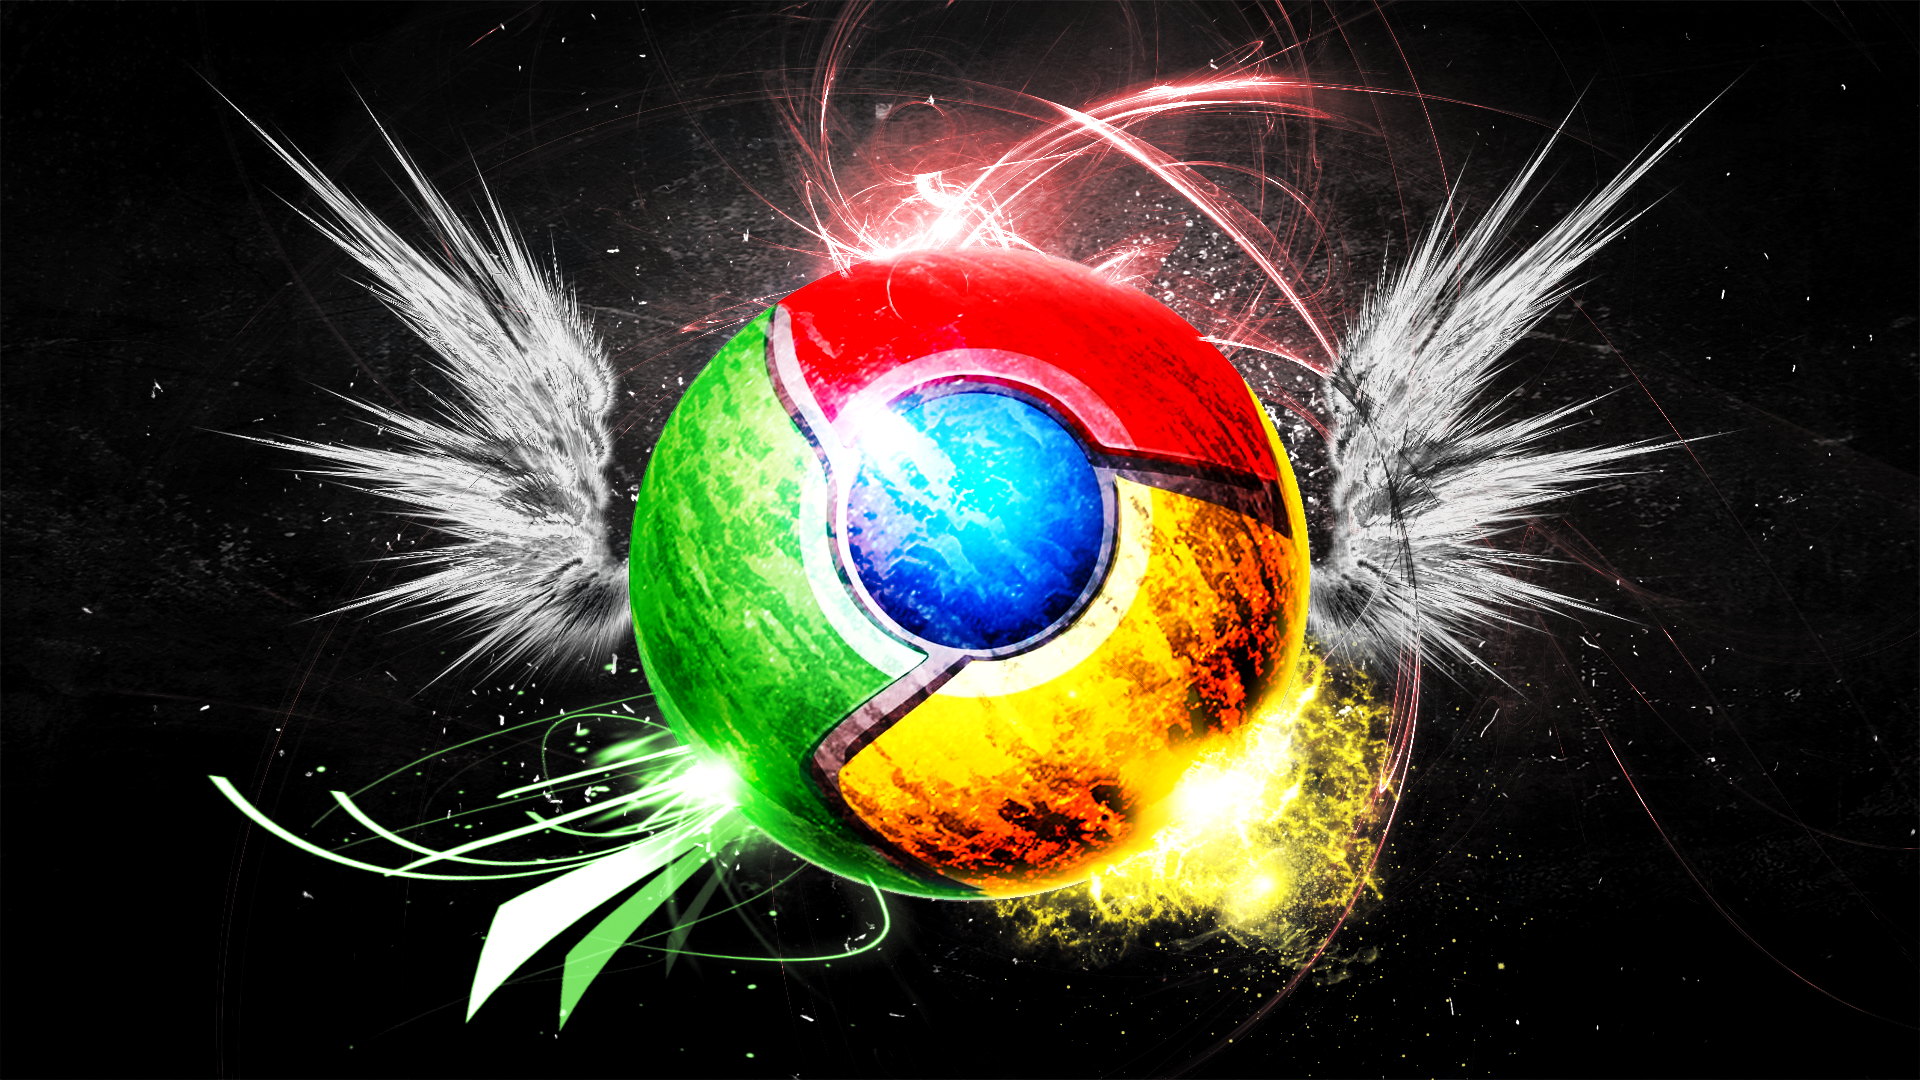 Google Chrome Wallpaper by Hardii 1920x1080